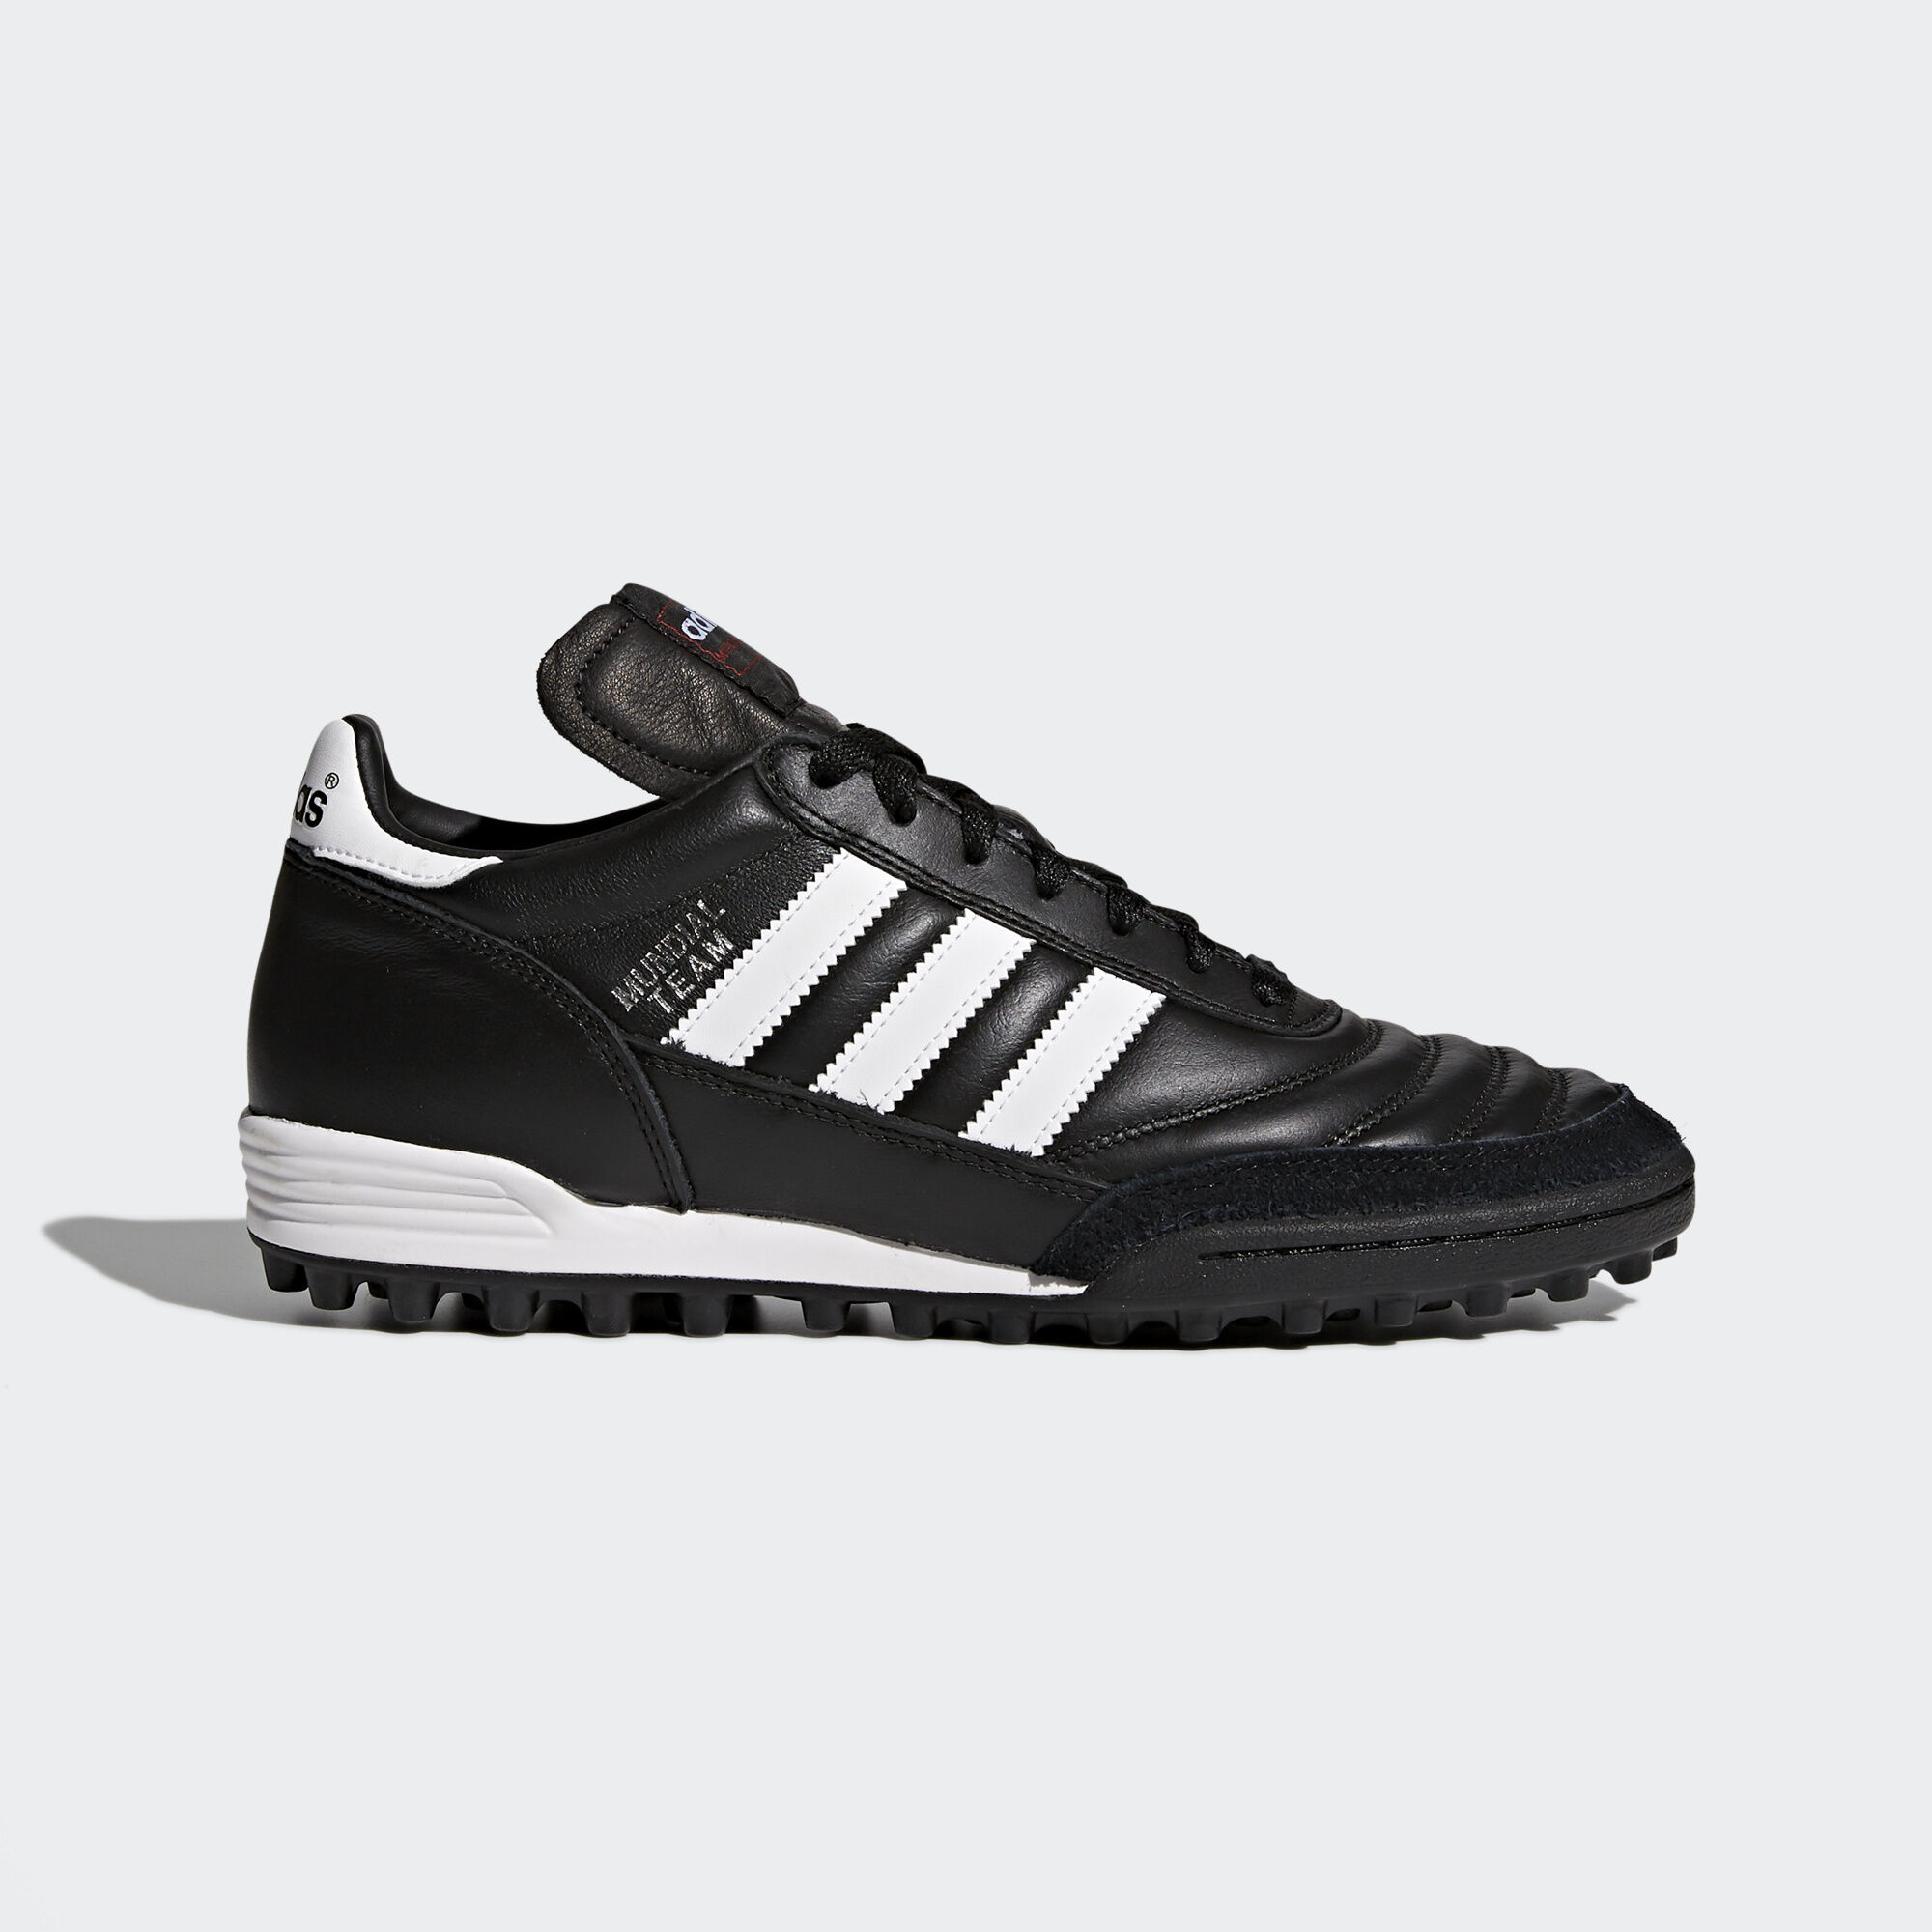 Running Shoes Brisbane